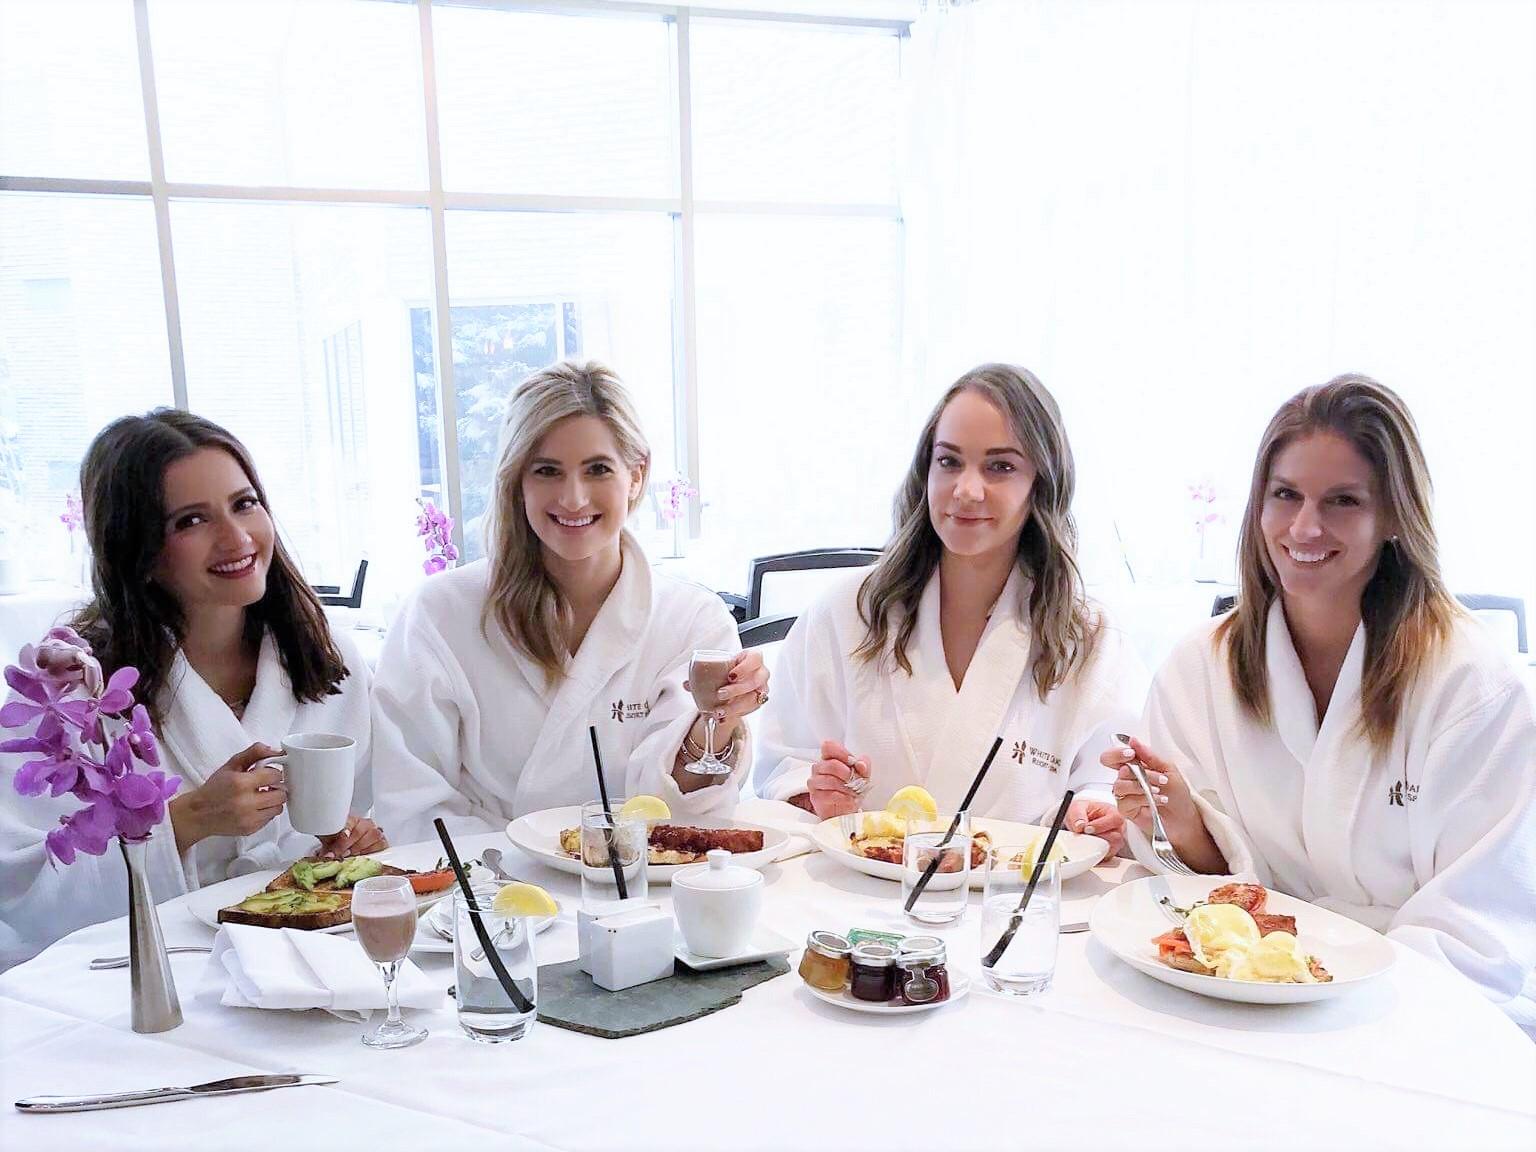 Bijuleni | How To Unwind at White Oaks Resort & Spa, Niagara on the Lake | Girls Weekend Getaway| Eating breakfast